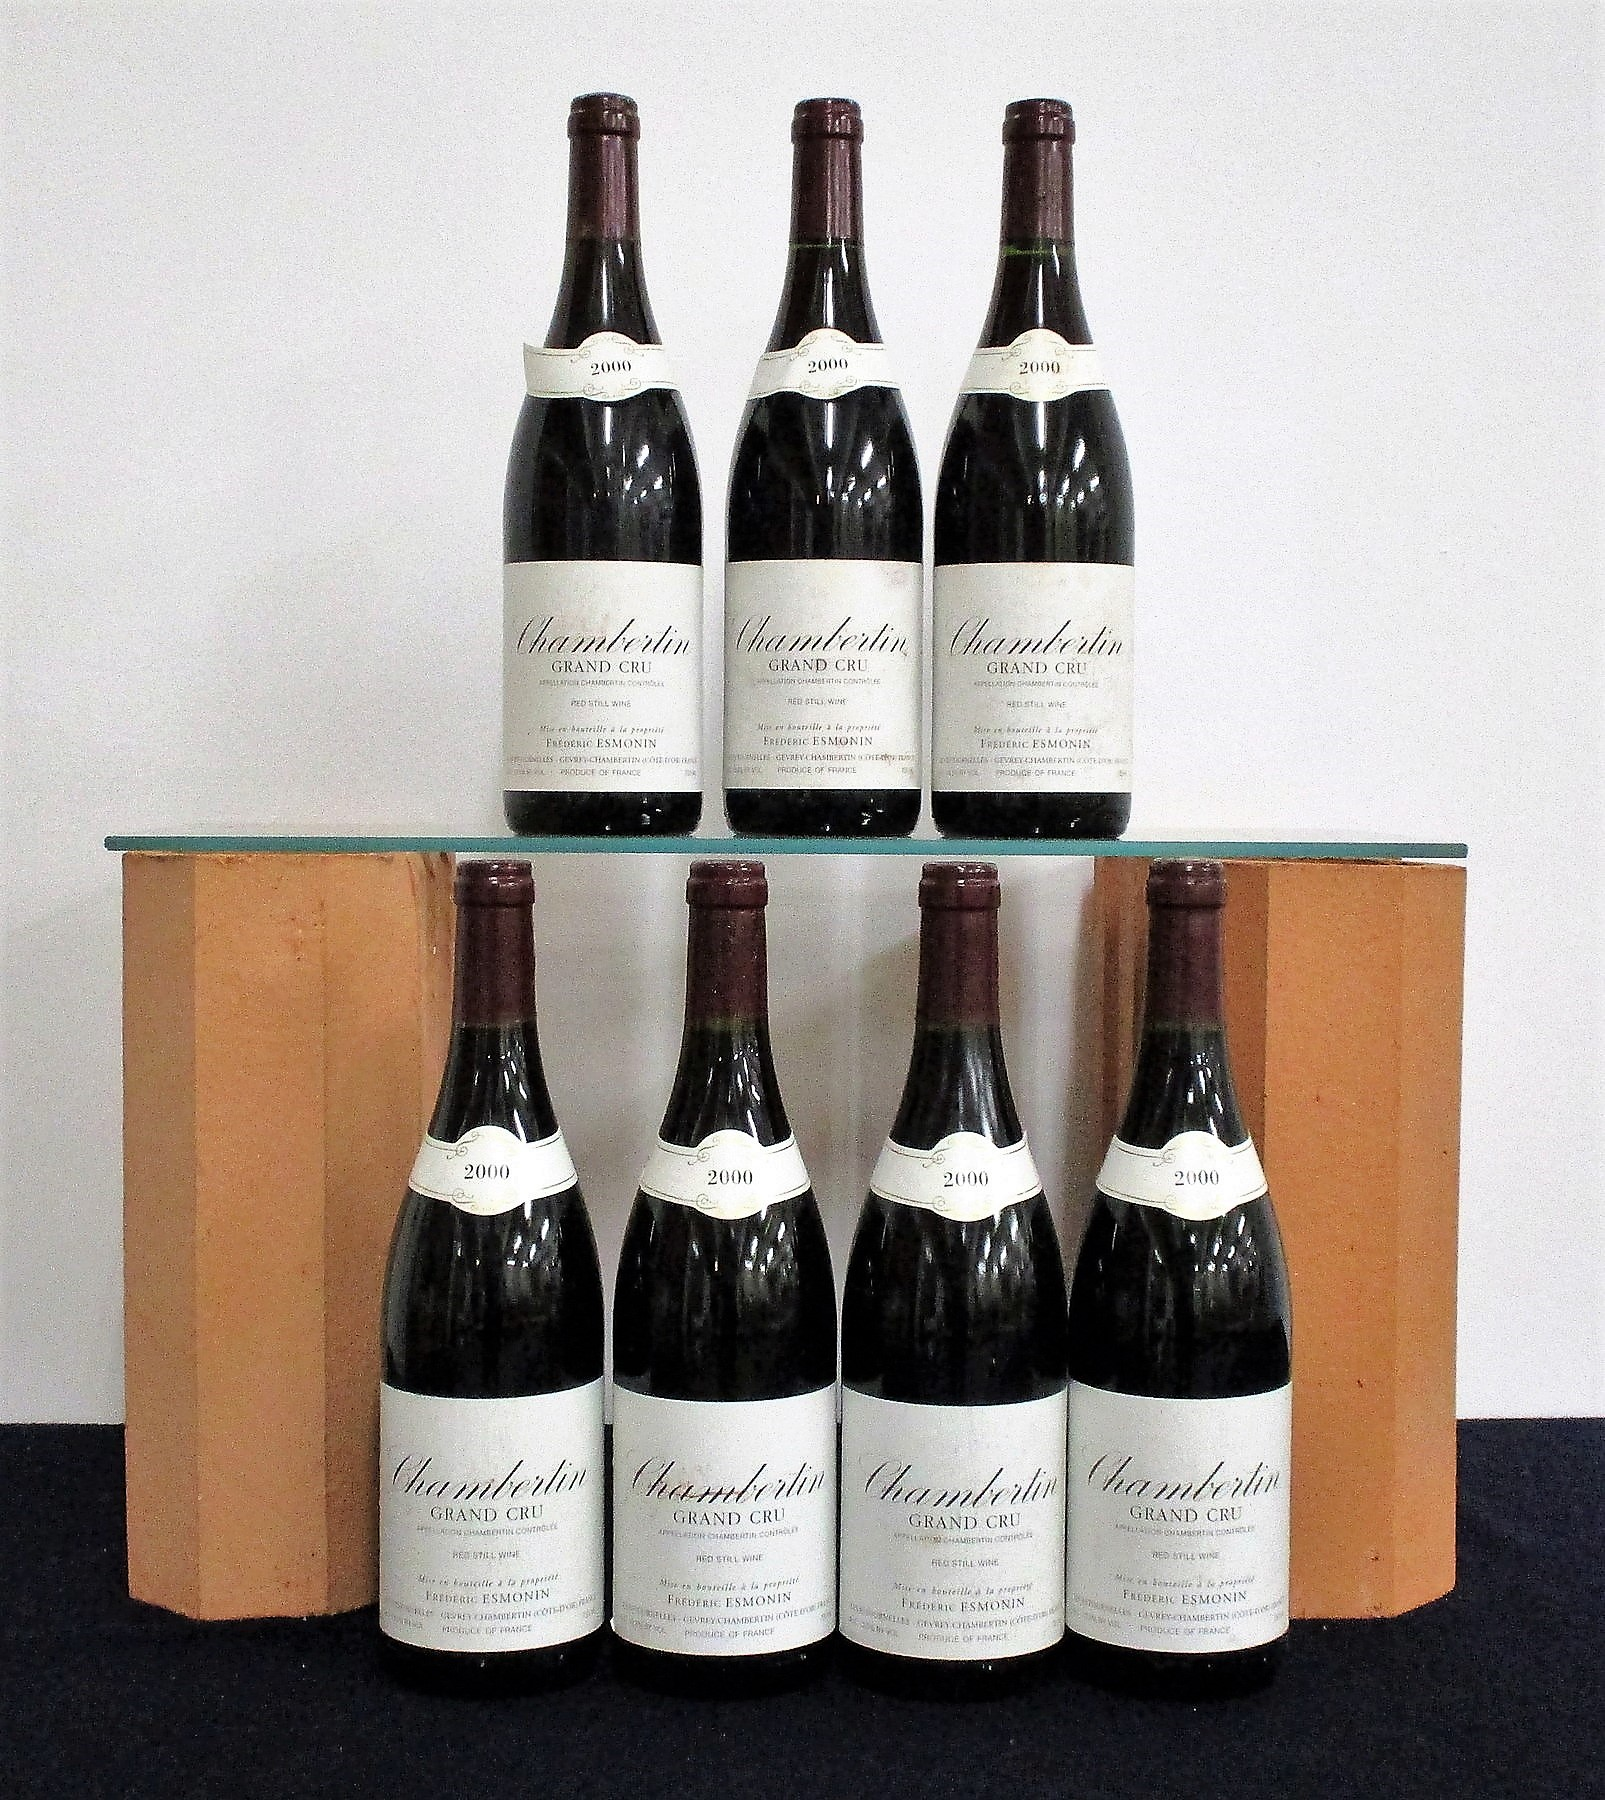 7 bts Chambertin Grand Cru 2000 Frédéric Esmonin 1 hf, 4 hf/i.n, 2 i.n, sl bs